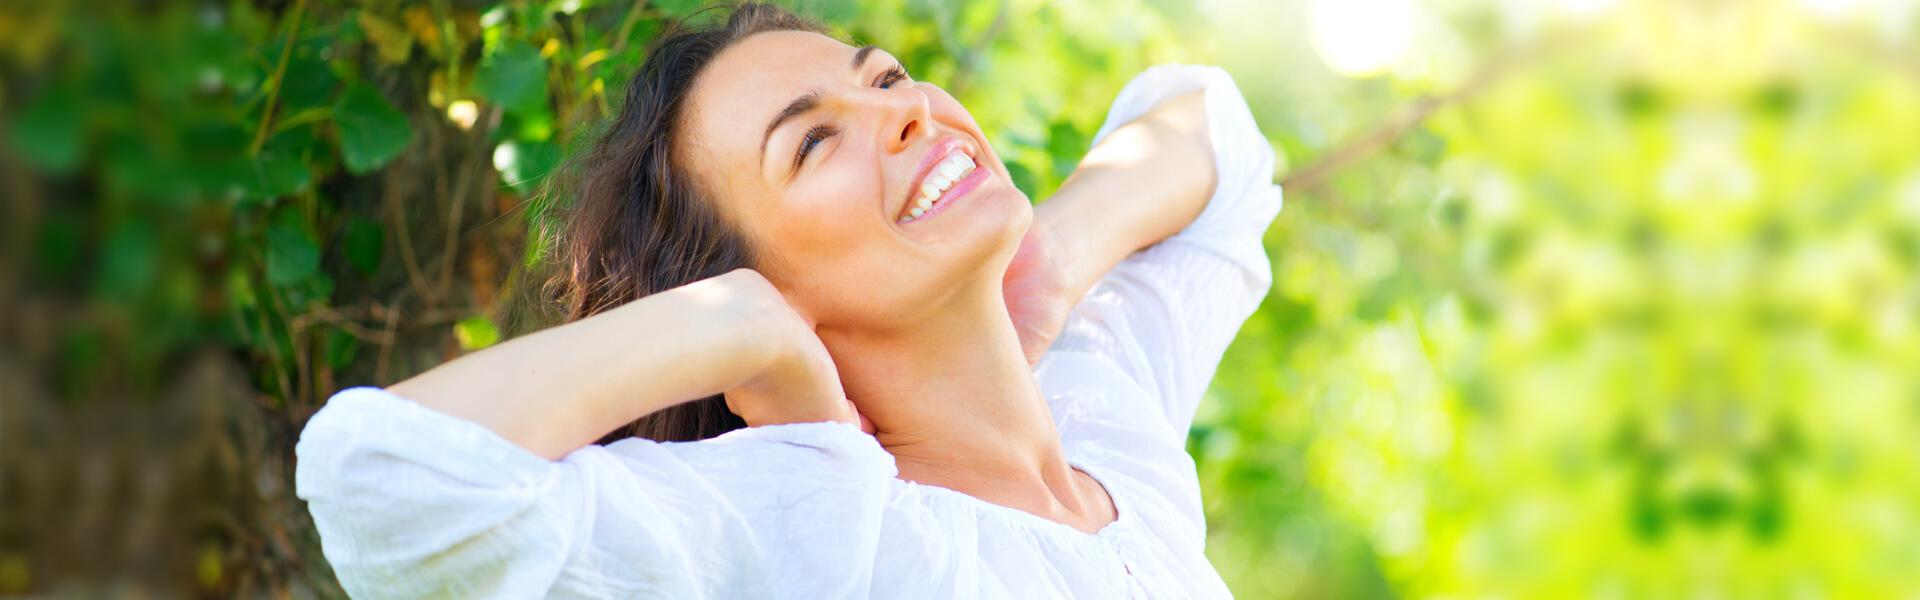 Dental Bridges: Types, Procedure, Benefits, and Lifespan